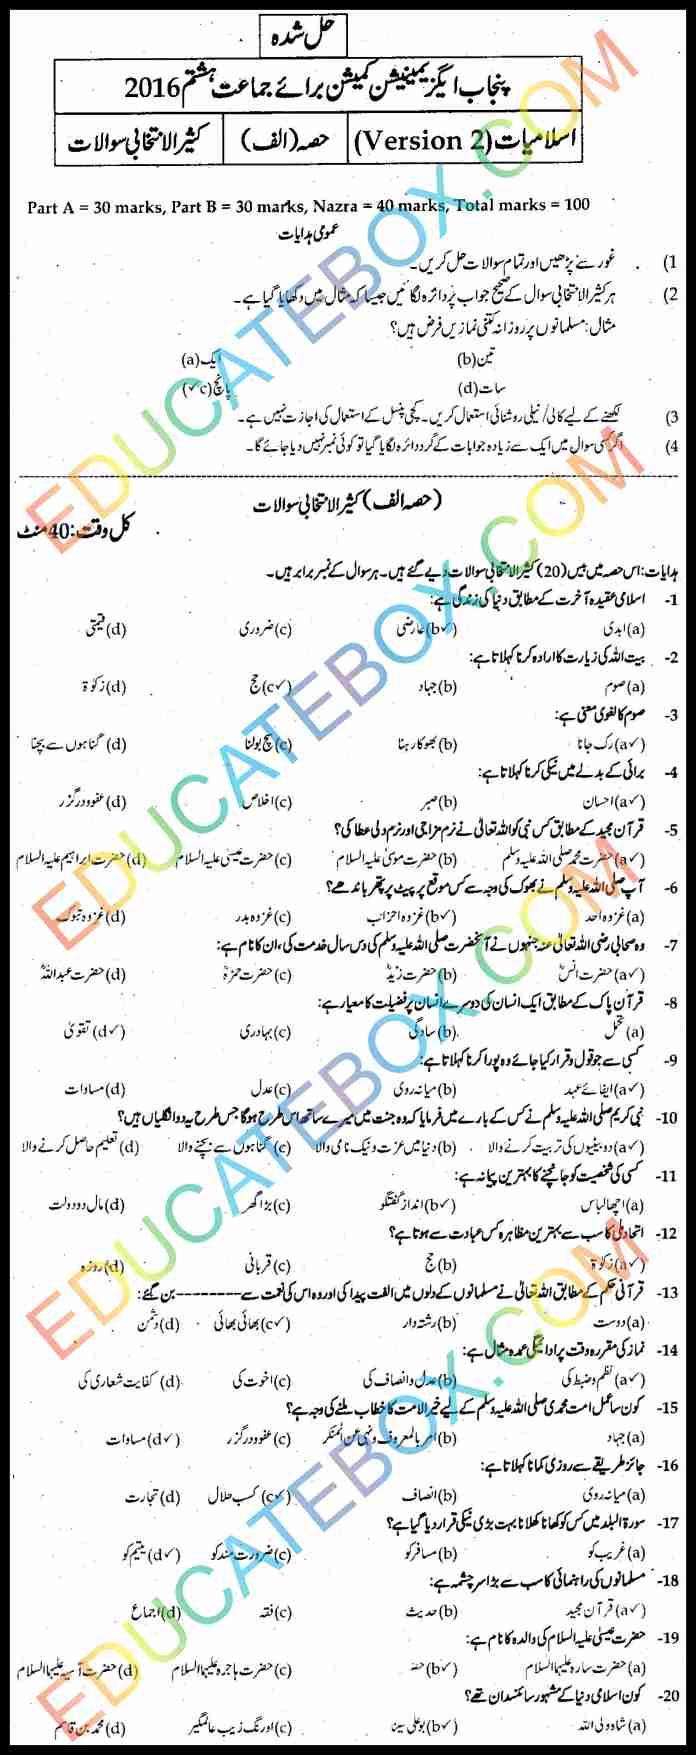 Past Paper 8th Class Islamiyat 2016 Solved Paper Punjab Board (PEC) Objective Type Version 2 اپ ٹو ڈیٹ پیپر آٹھویں کلاس اسلامیات 2016 حل شدہ پیپر پنجاب بورڈ آبجیکٹیو ٹائپ۔ ورژن2